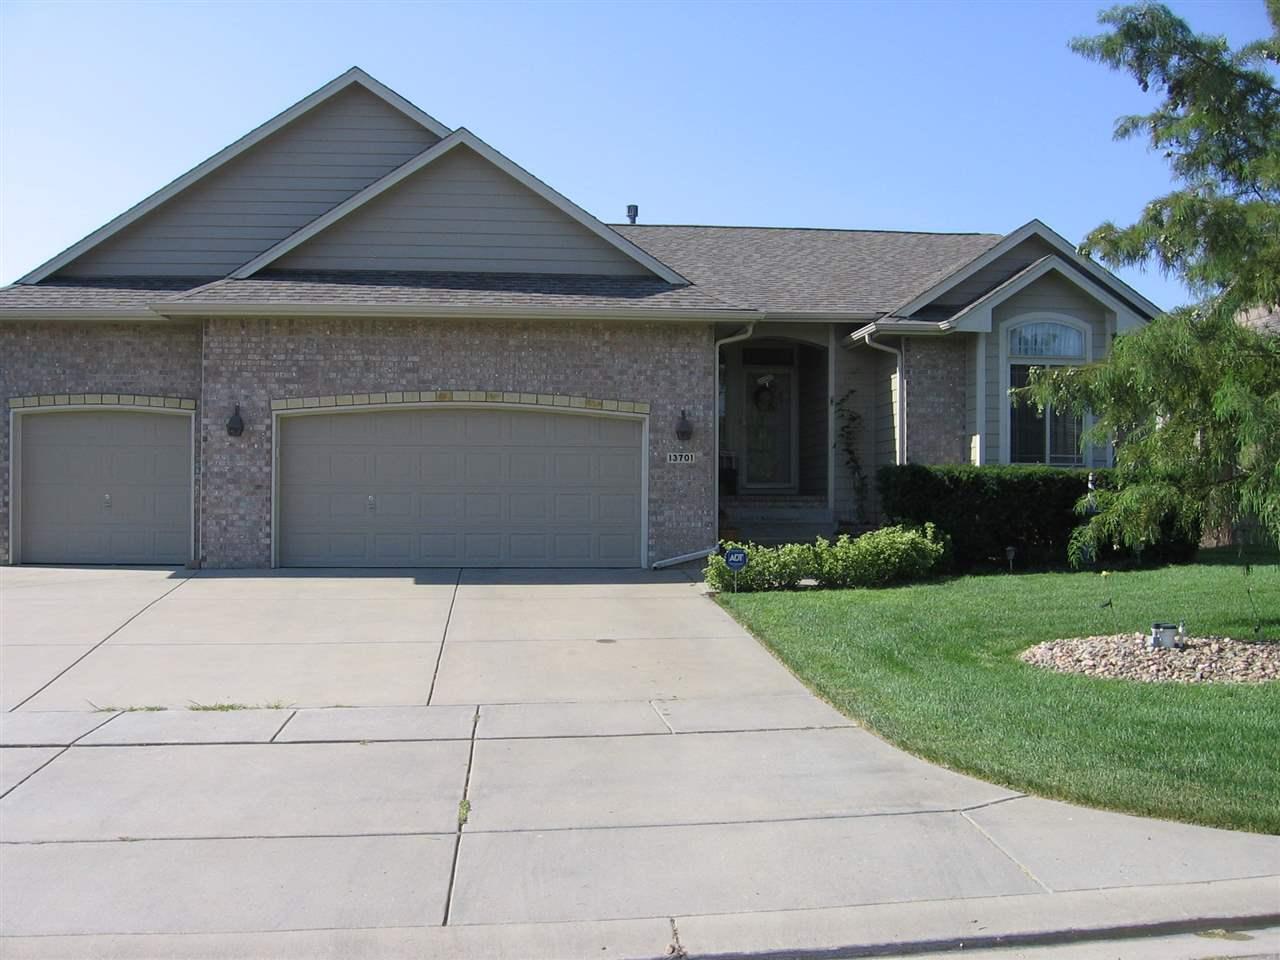 13701 W Texas St., Wichita, KS 67235